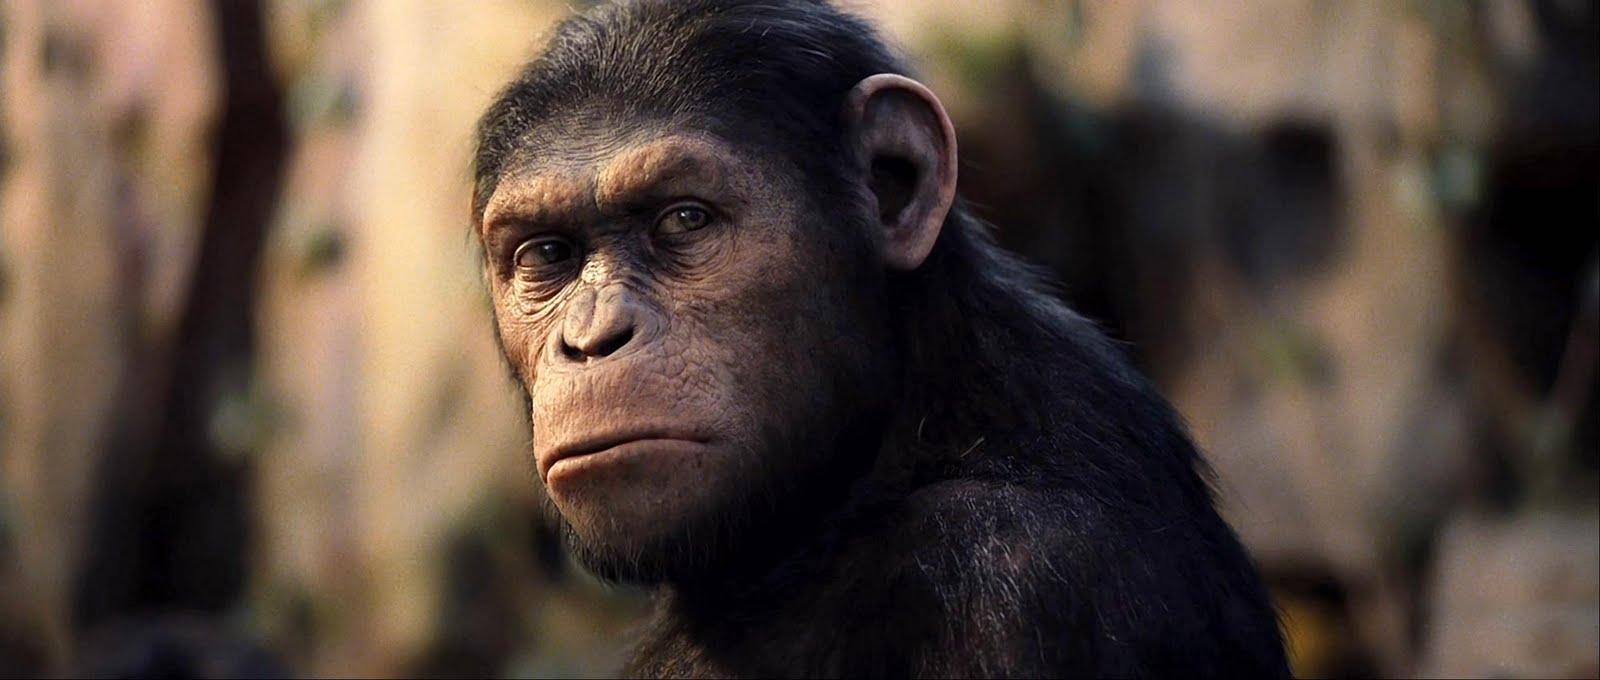 planeta-dos-macacos-cesar-capa